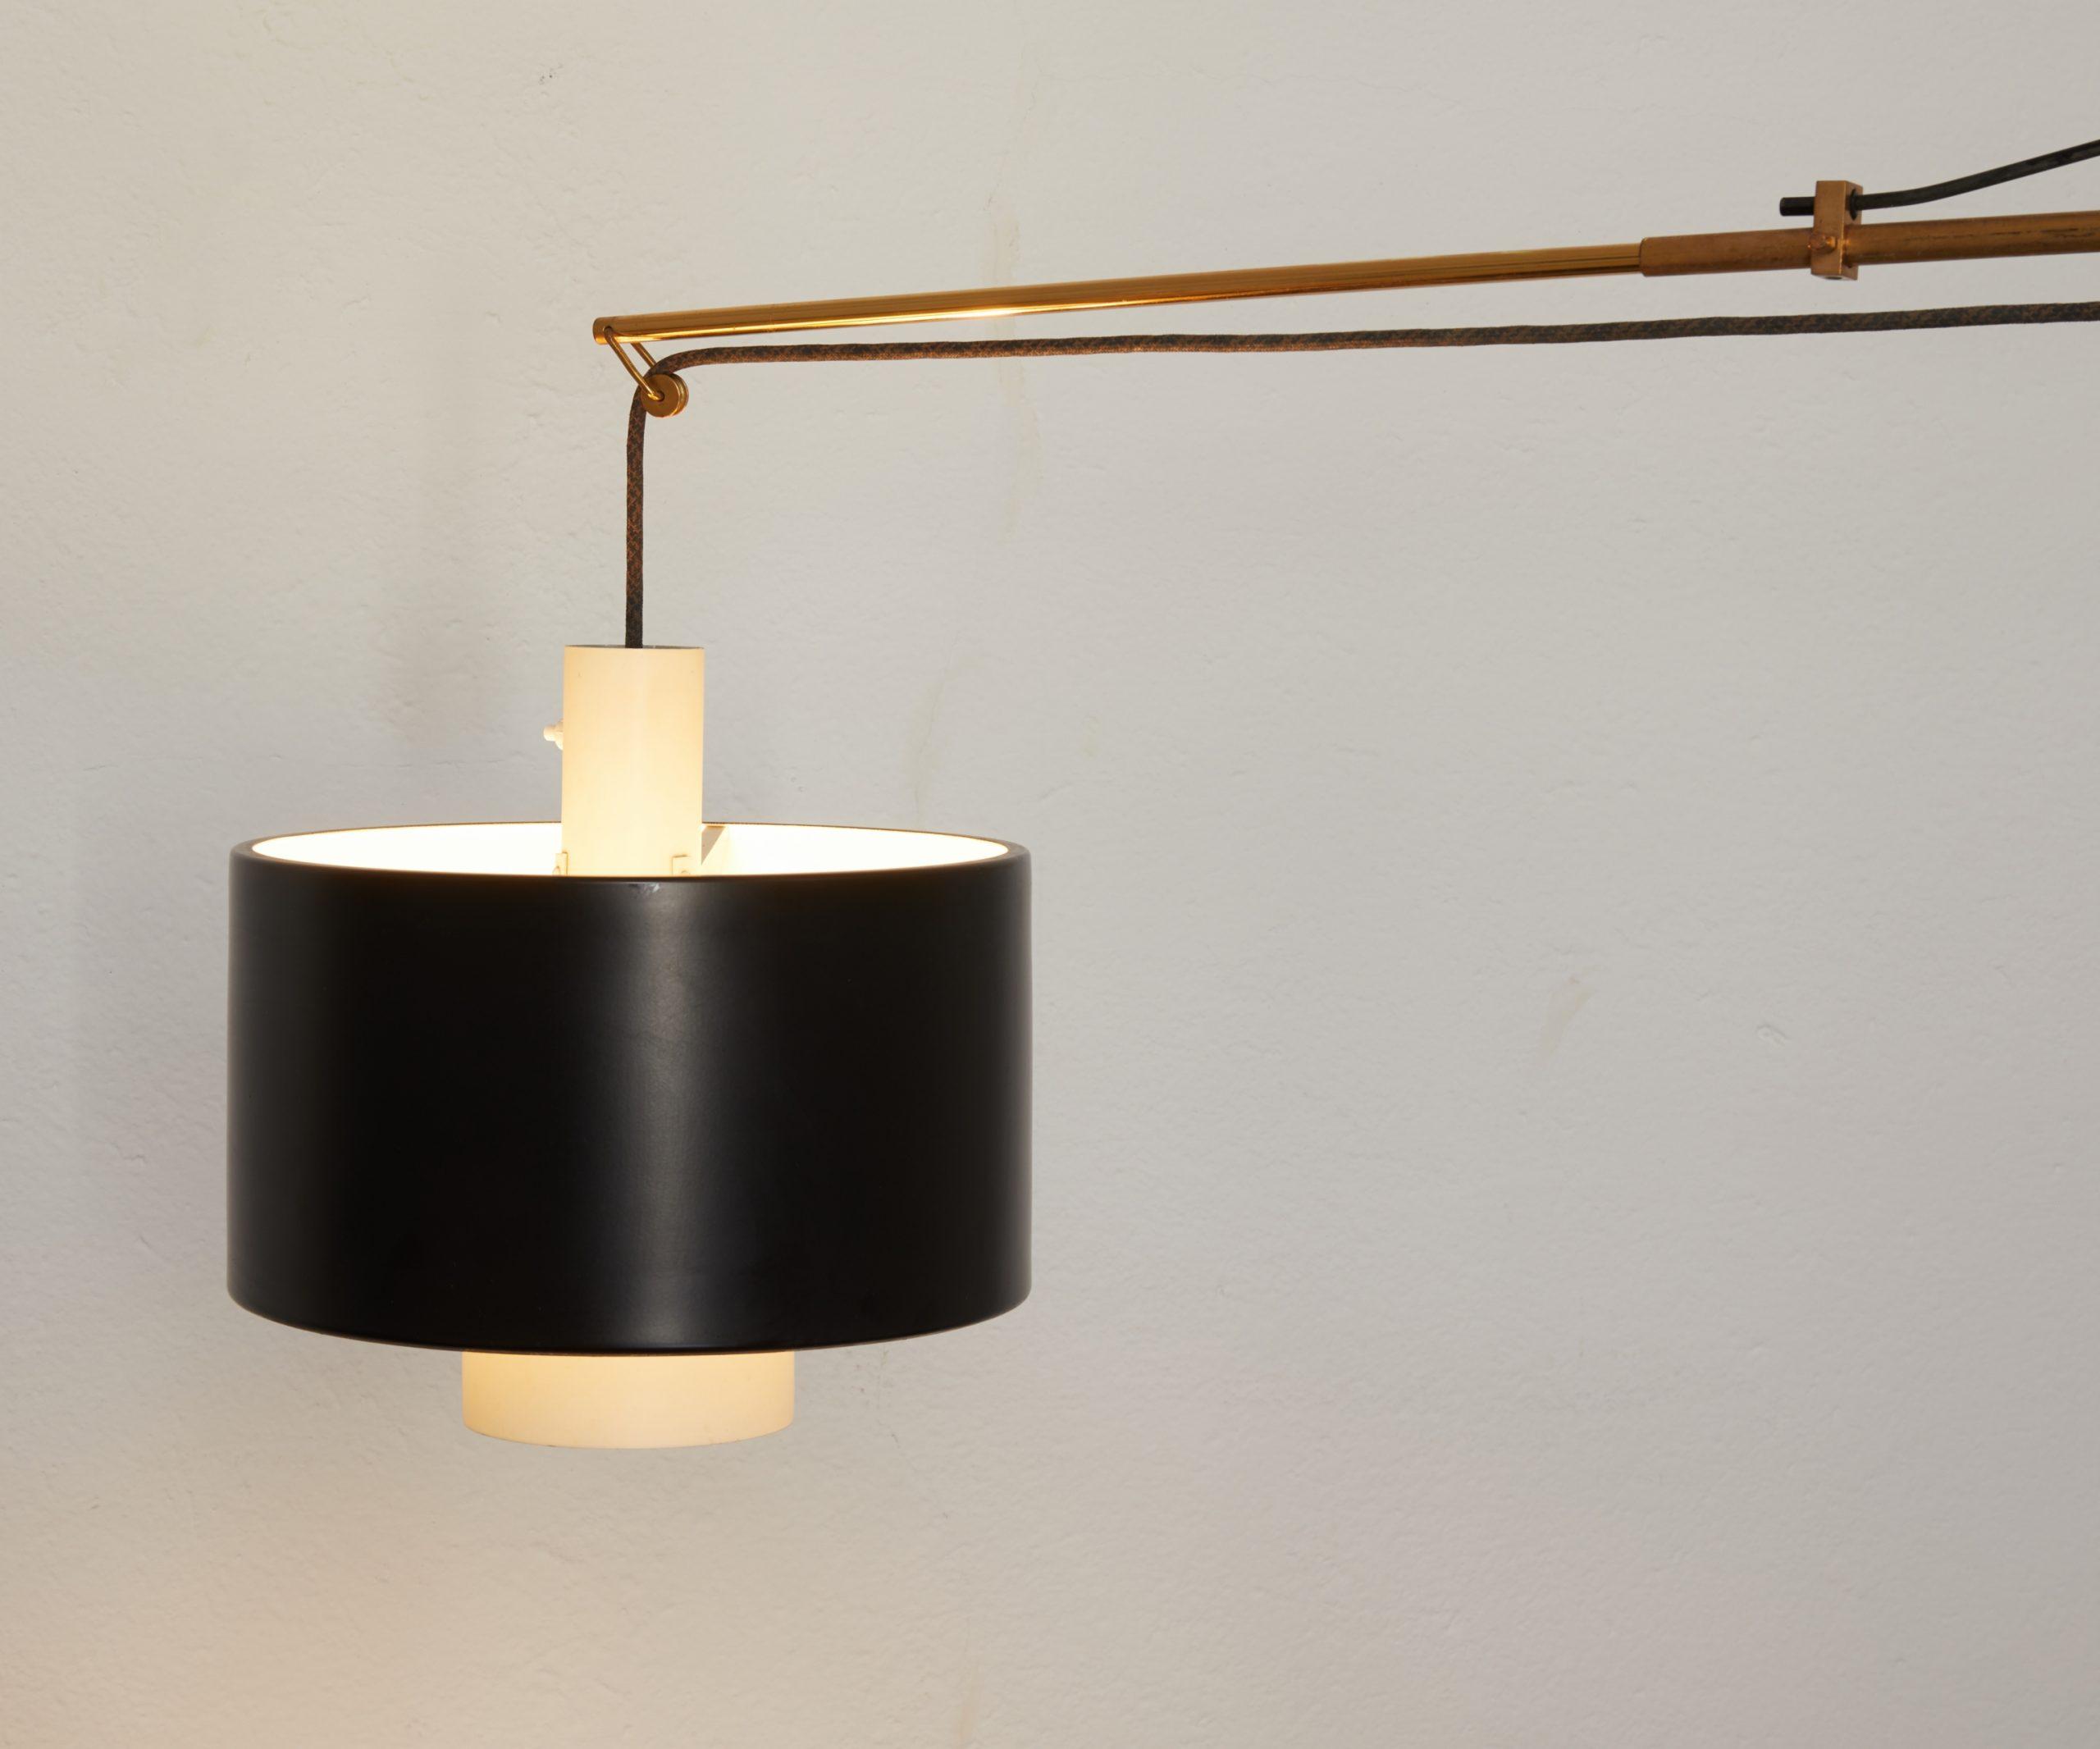 brass-wall-lamp-model-2061-by-gaetano-scolari-for-stilnovo-1954-image-06